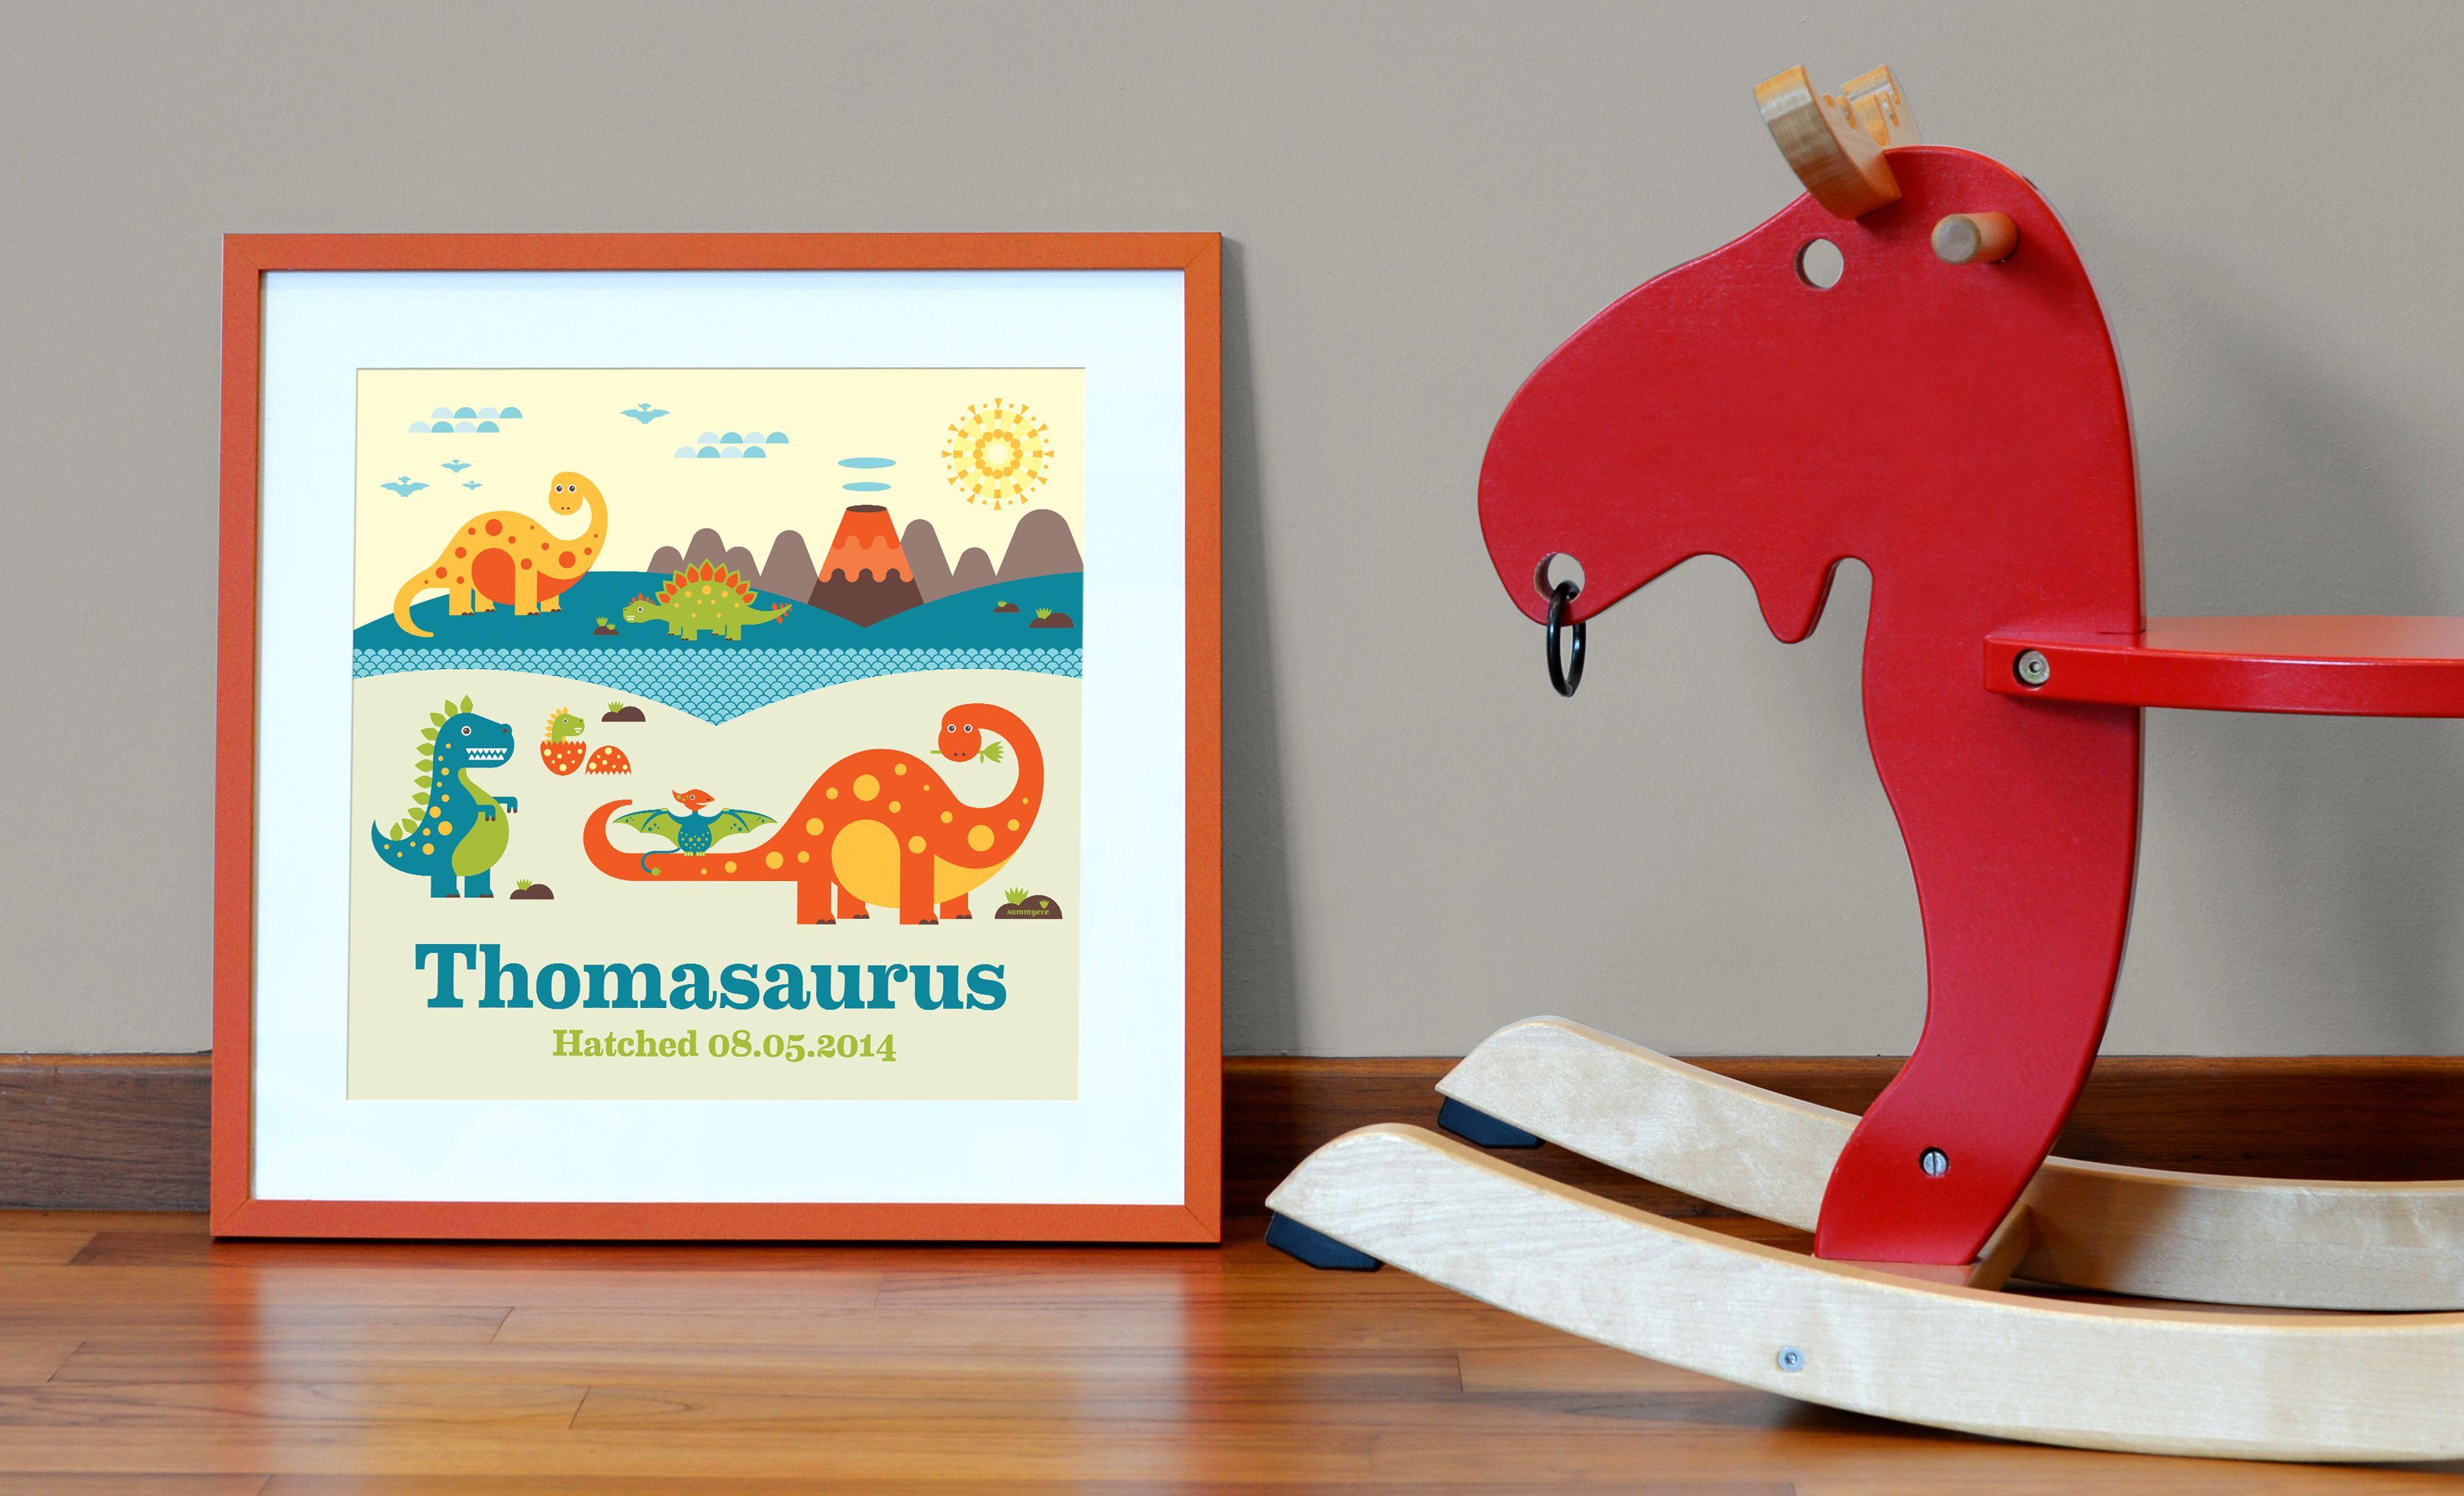 NEW Sammyeve Dino friends personalized art for children http://sammyeve.com/garden